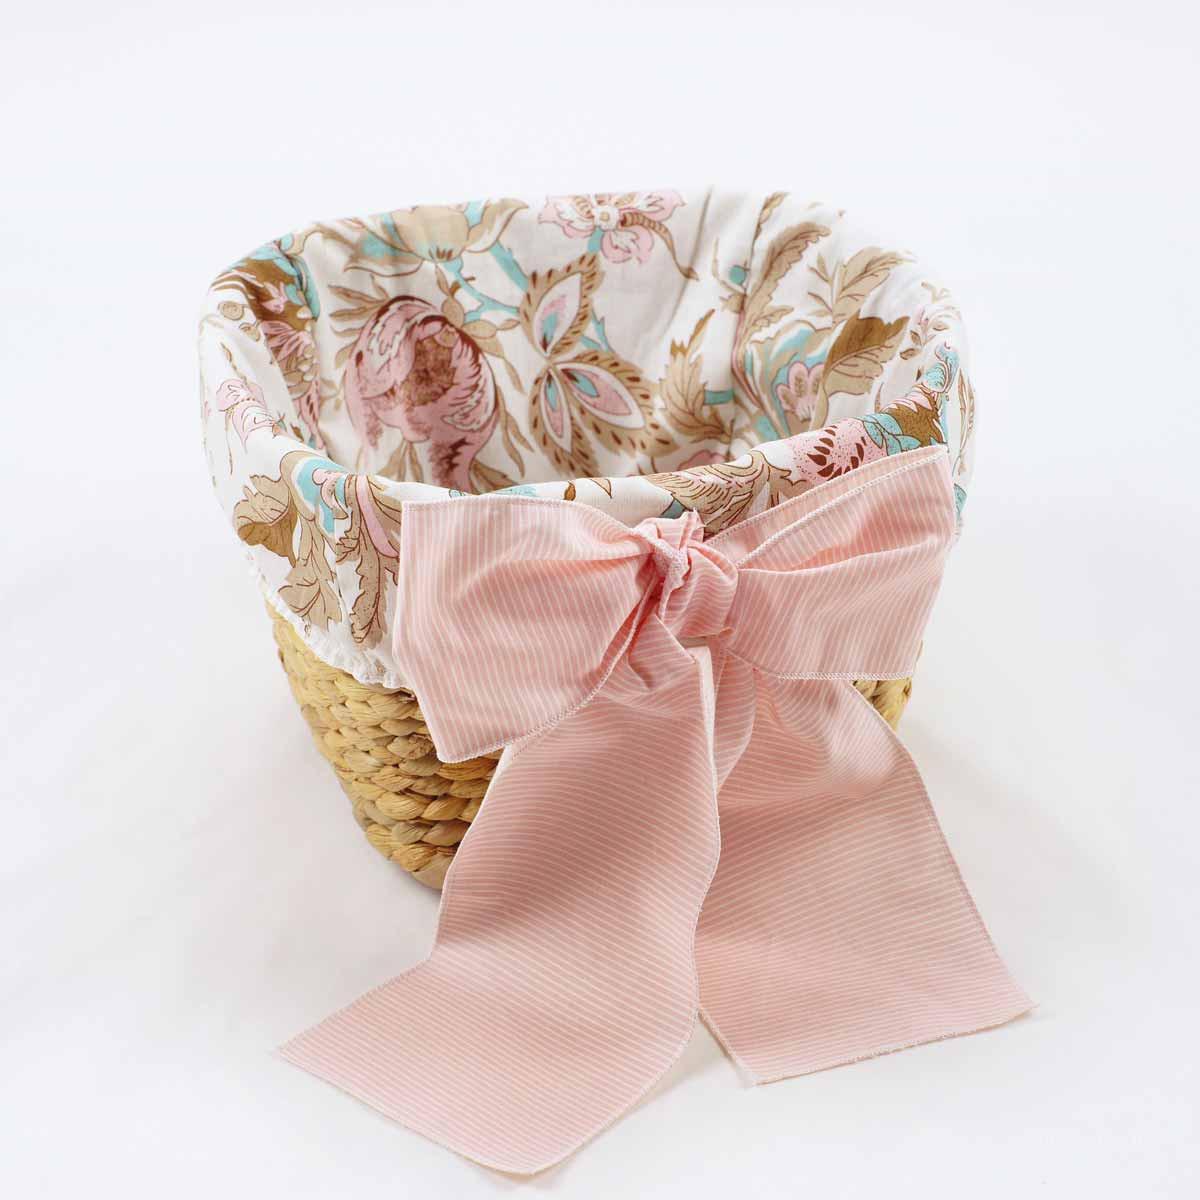 067b57db79b -10% Spiti Shop Καλαθάκι Καλλυντικών Ninna Nanna Sweet Floral